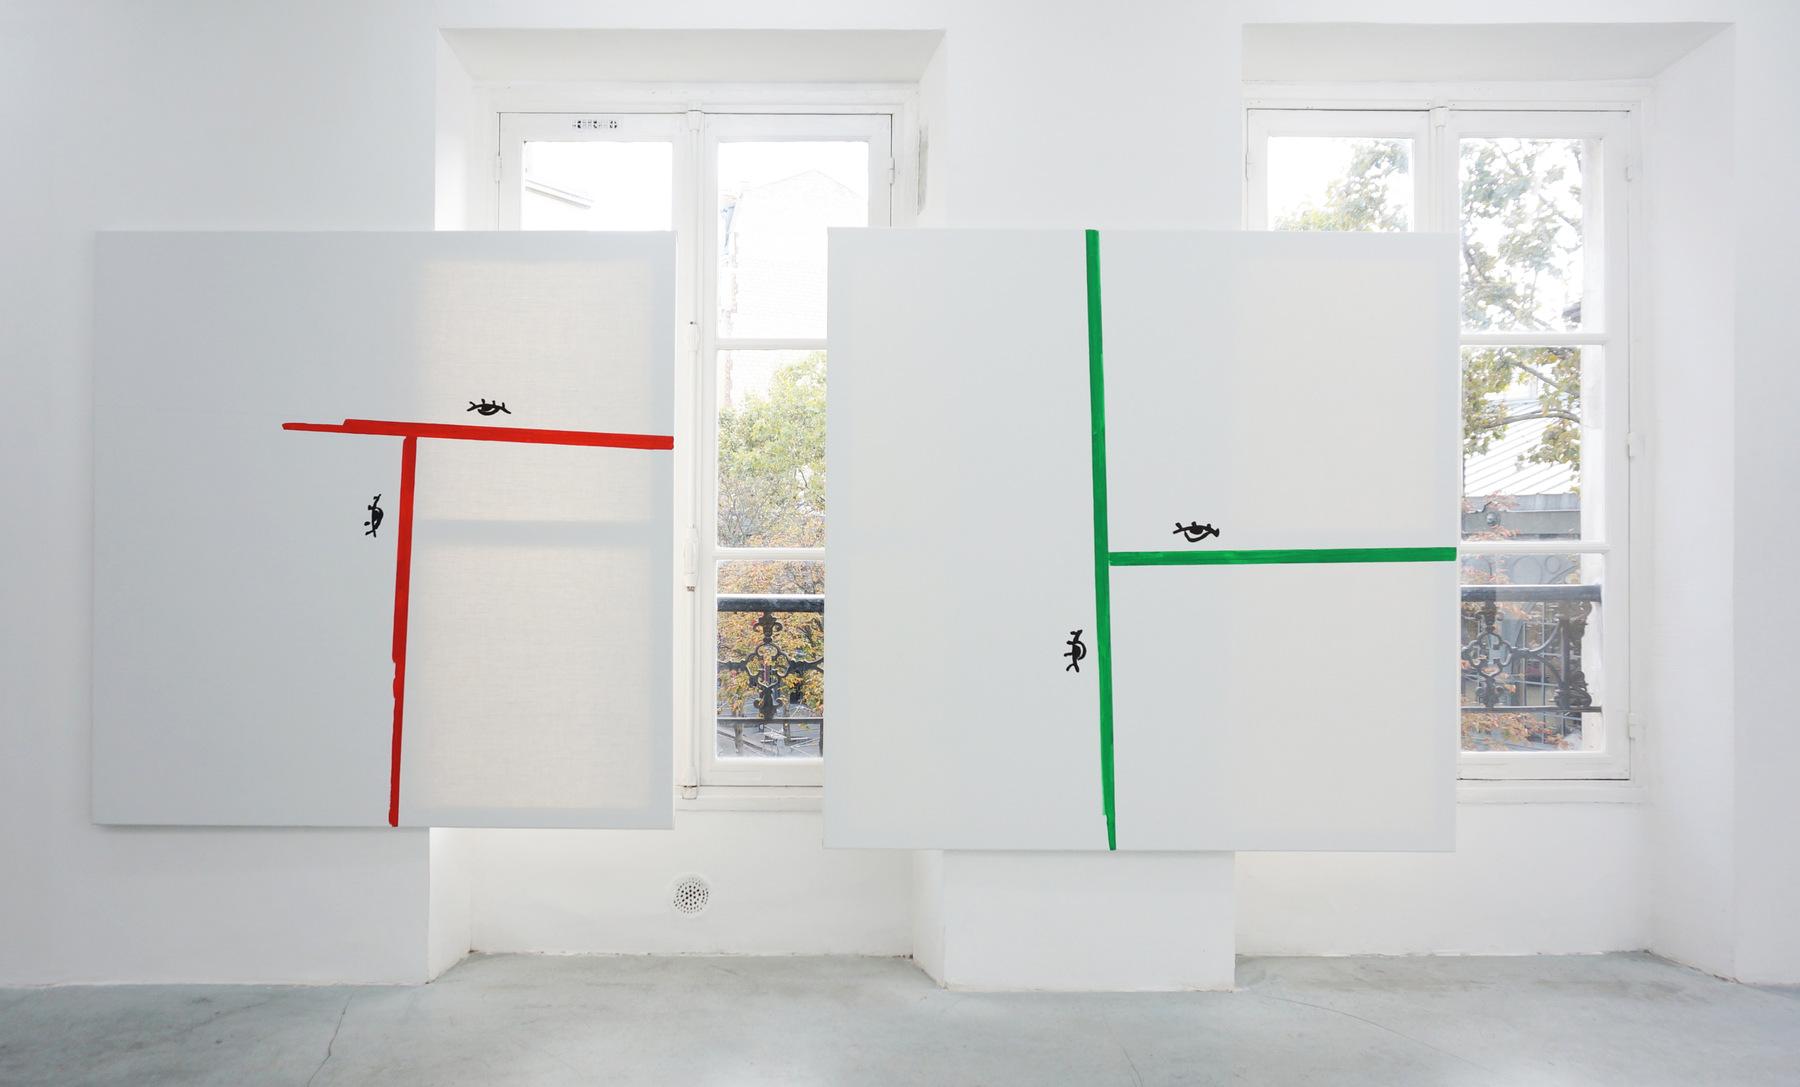 Galerie Joseph Tang _Alexander Lieck_Oci Ciornie_2015_03